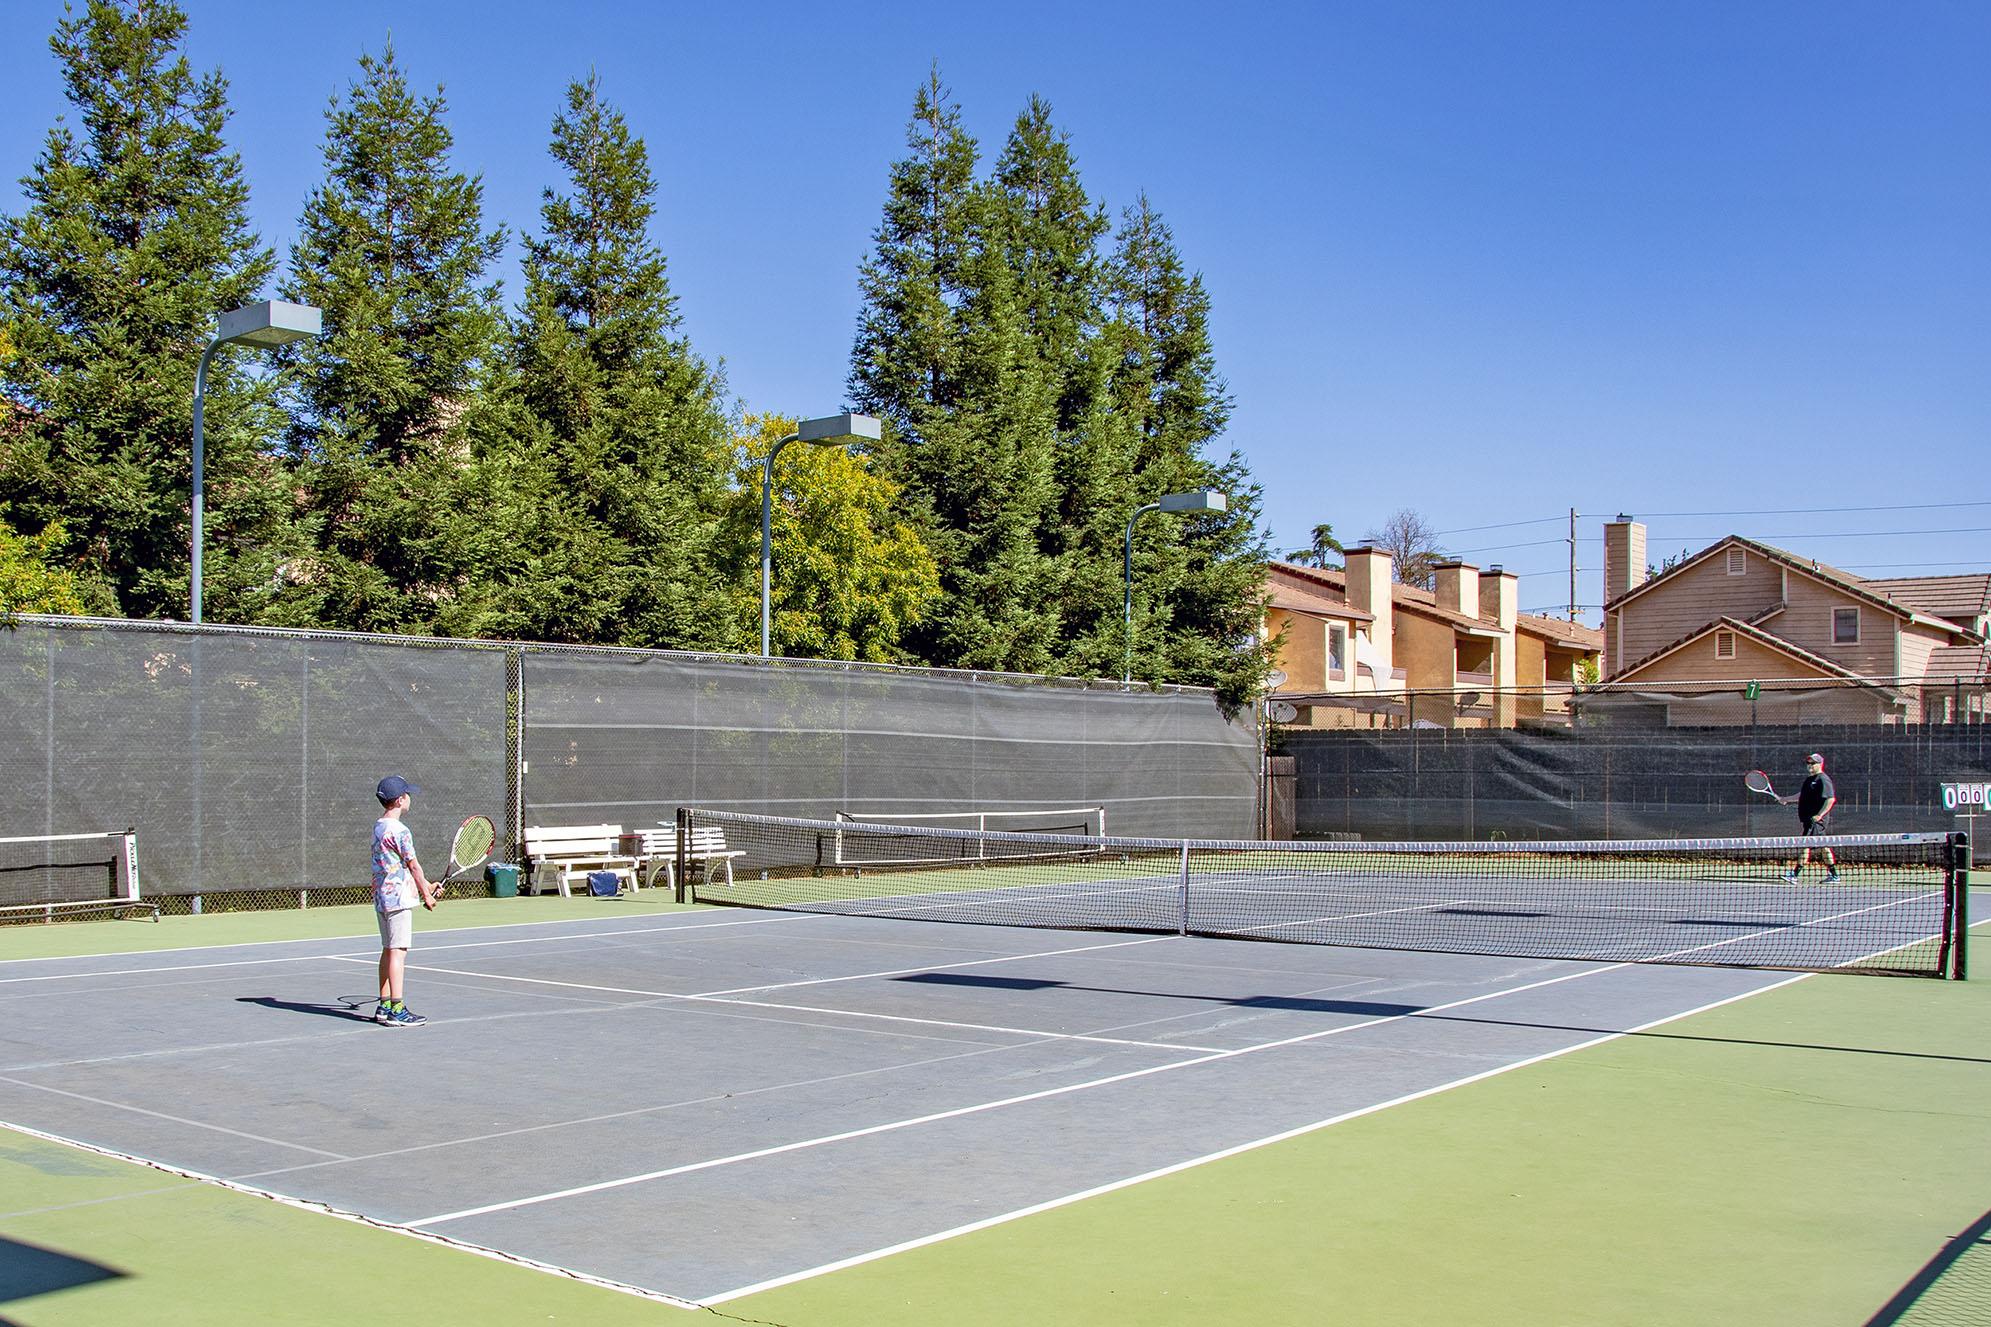 Tennis Turlock Sportresor